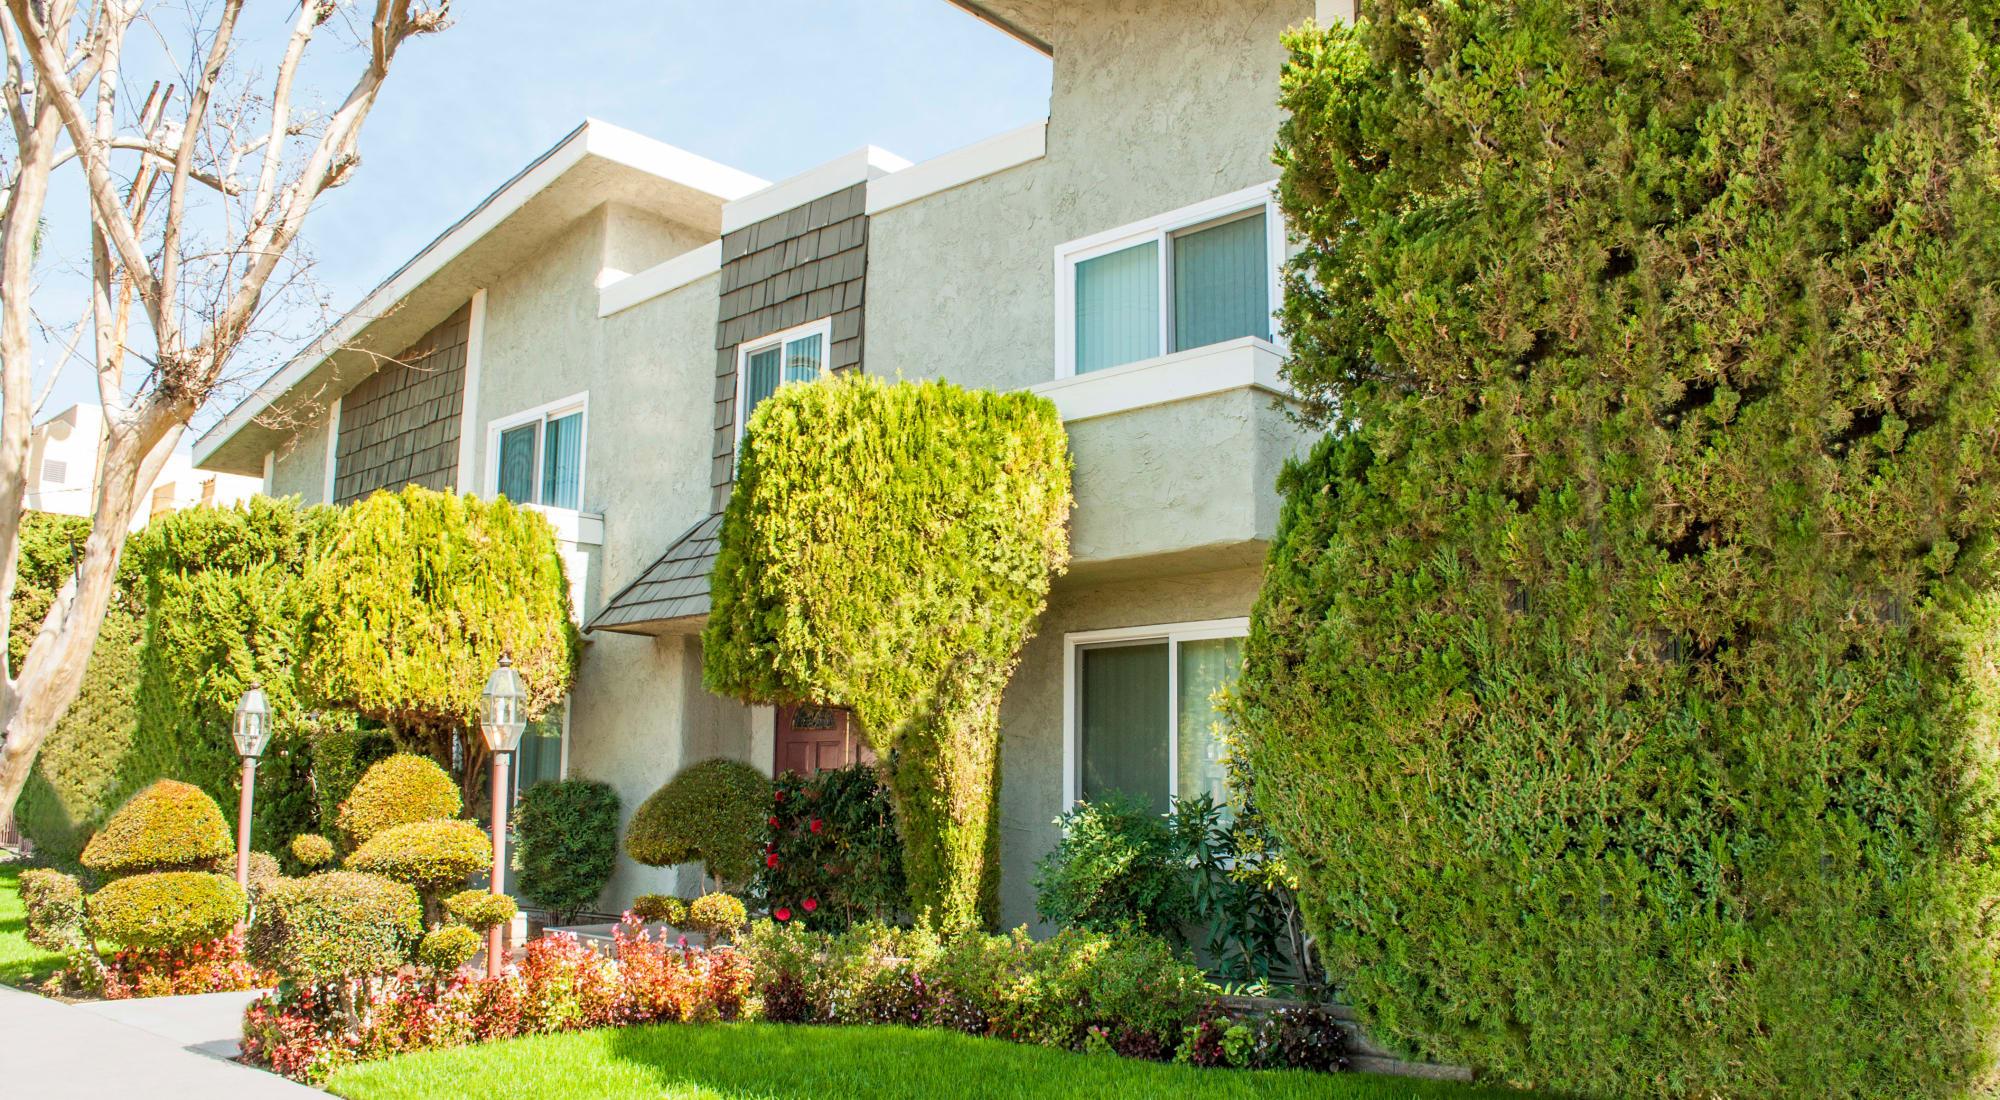 Front entrance and lawn at Sherman Oaks, CA